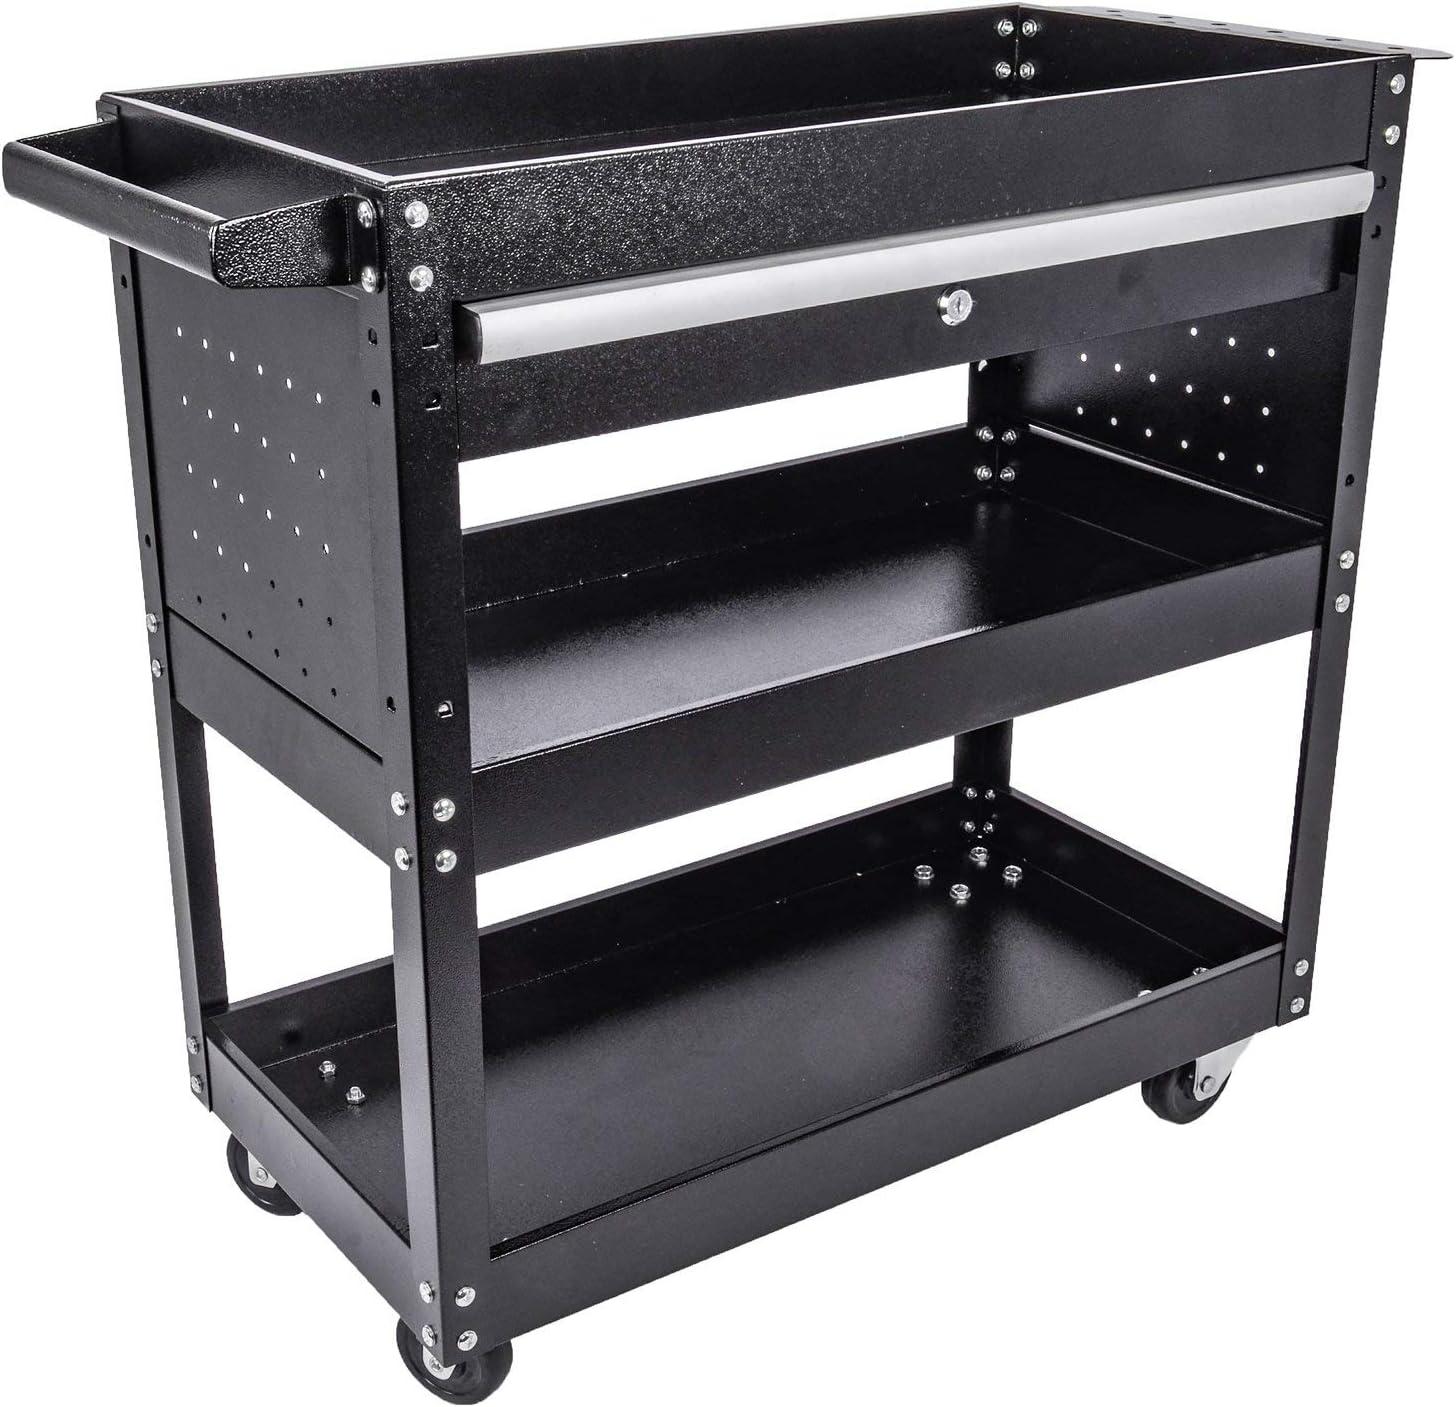 HaGa/® Caja de cart/ón plegable 10 cm x 10 cm x 120 cm 5 unidades